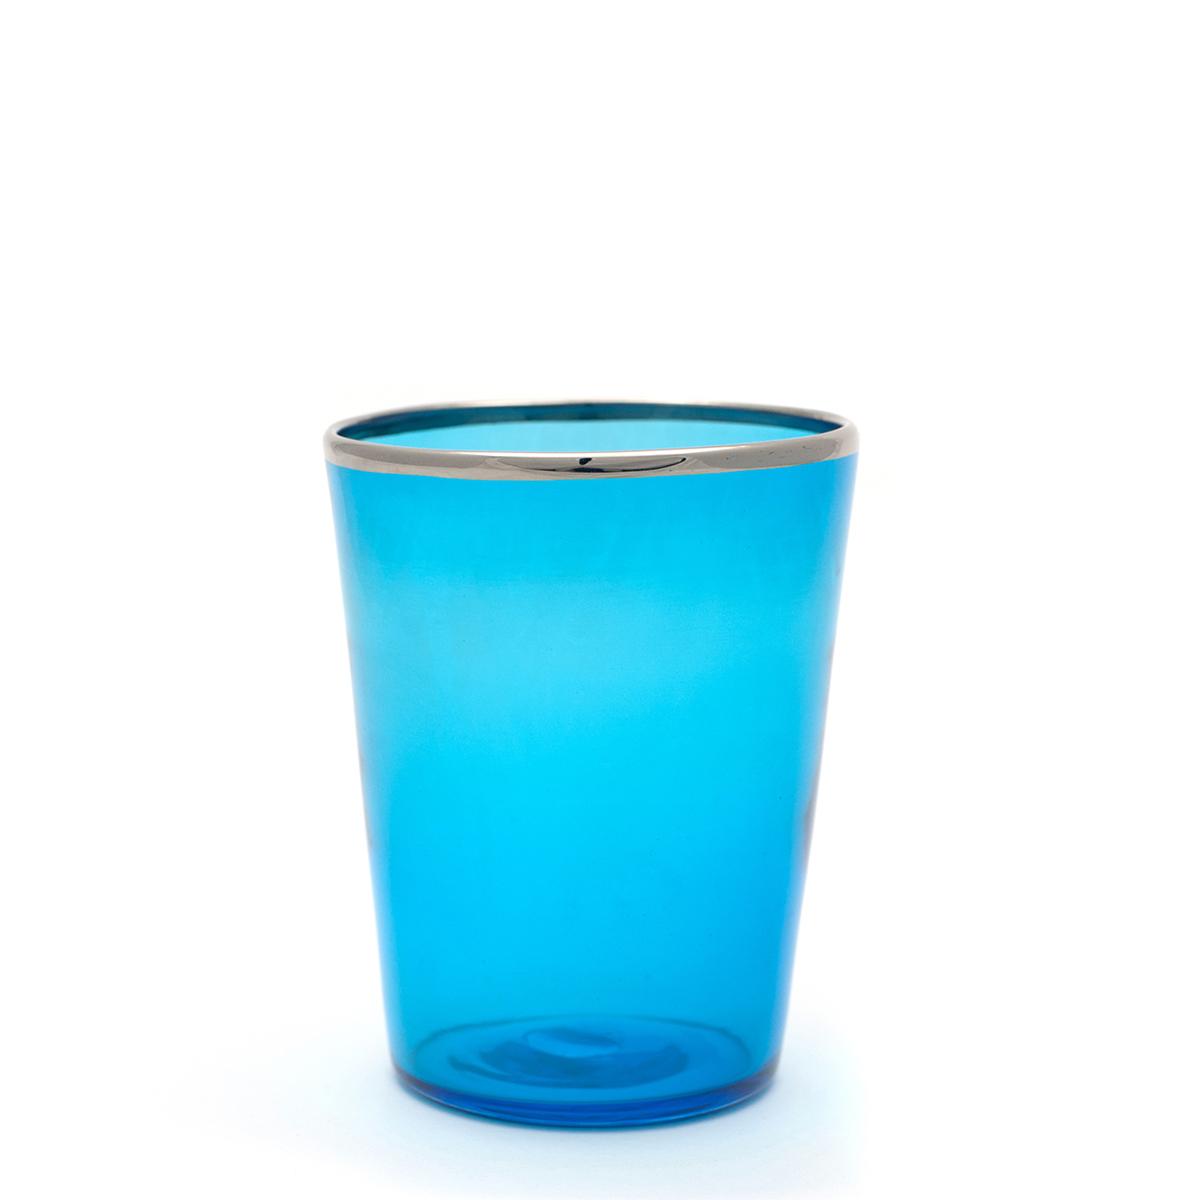 vaso_blue_acquamare_glass_murano_handmade_design_giberto_platinum_rim_wine